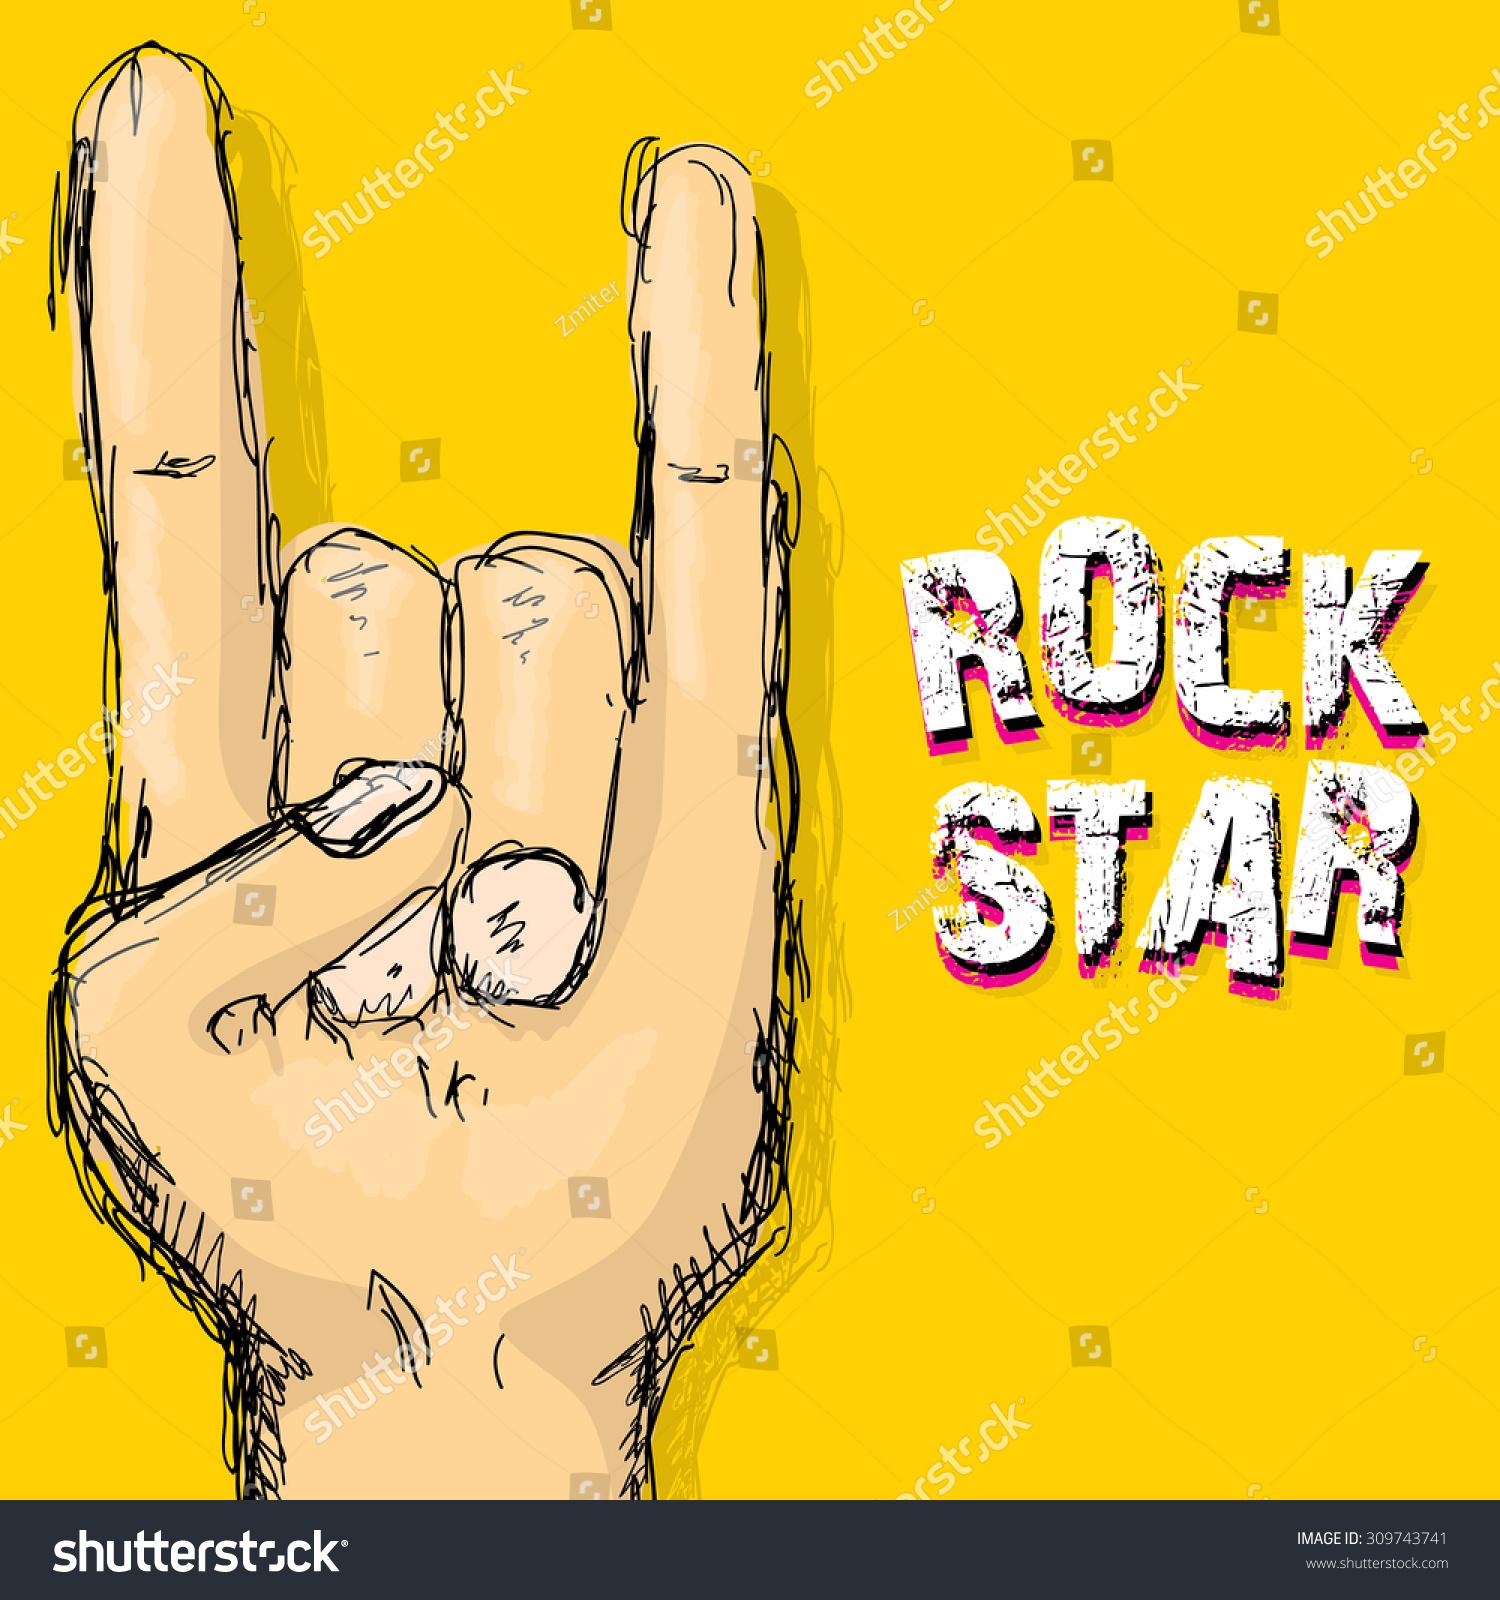 Rock n roll poster design - Vector Doodle Hand Sign Rock N Roll Music Rock N Roll Icon Rock Concert